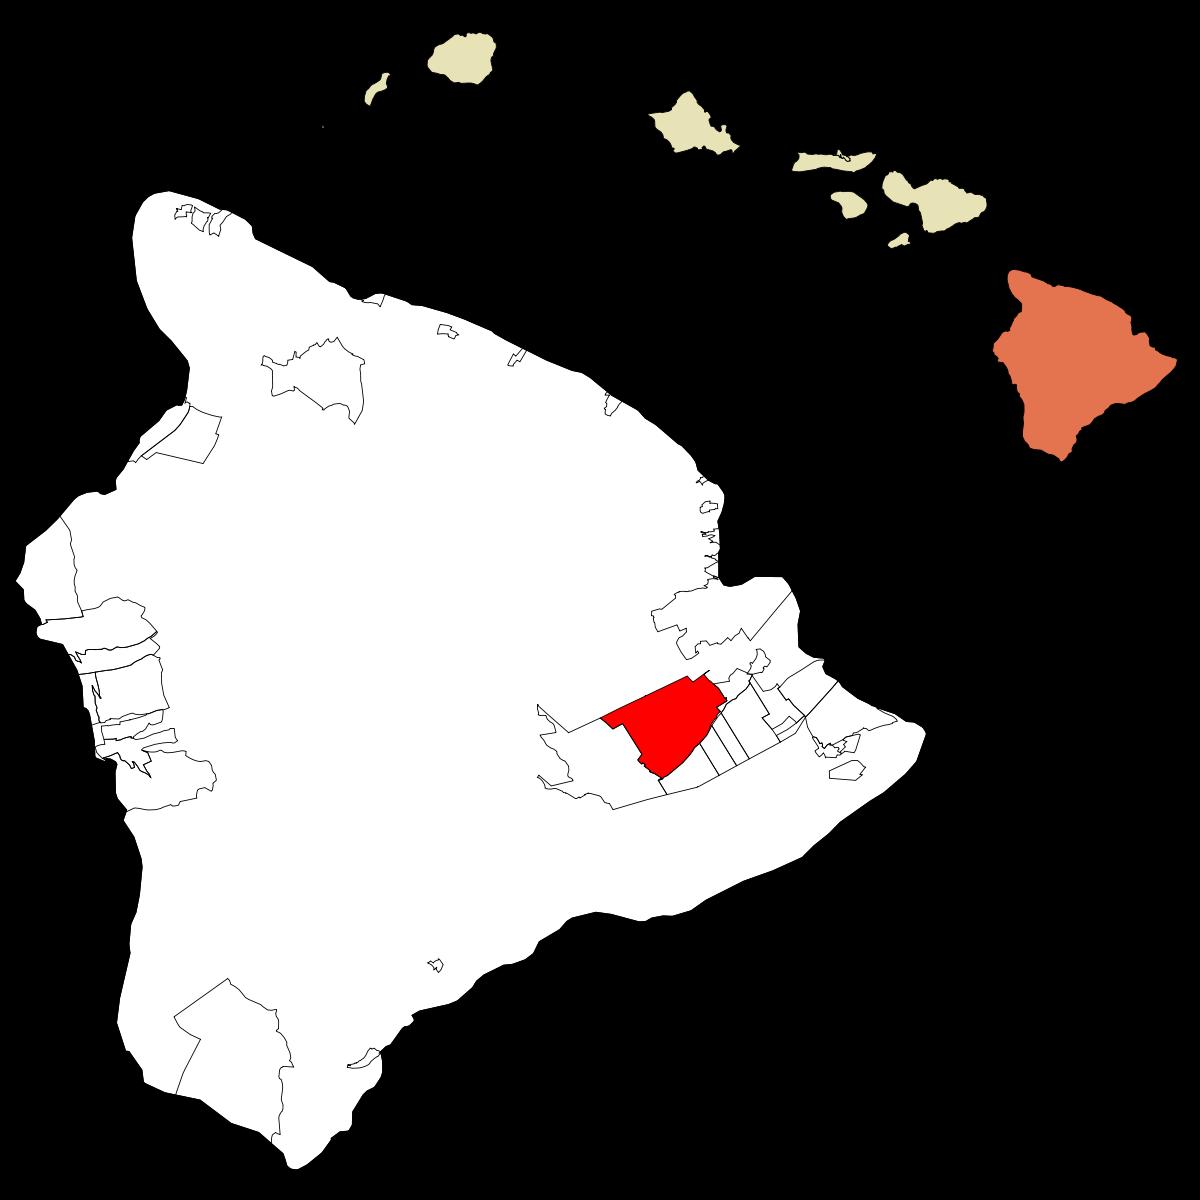 1200x1200 Mountain View, Hawaii